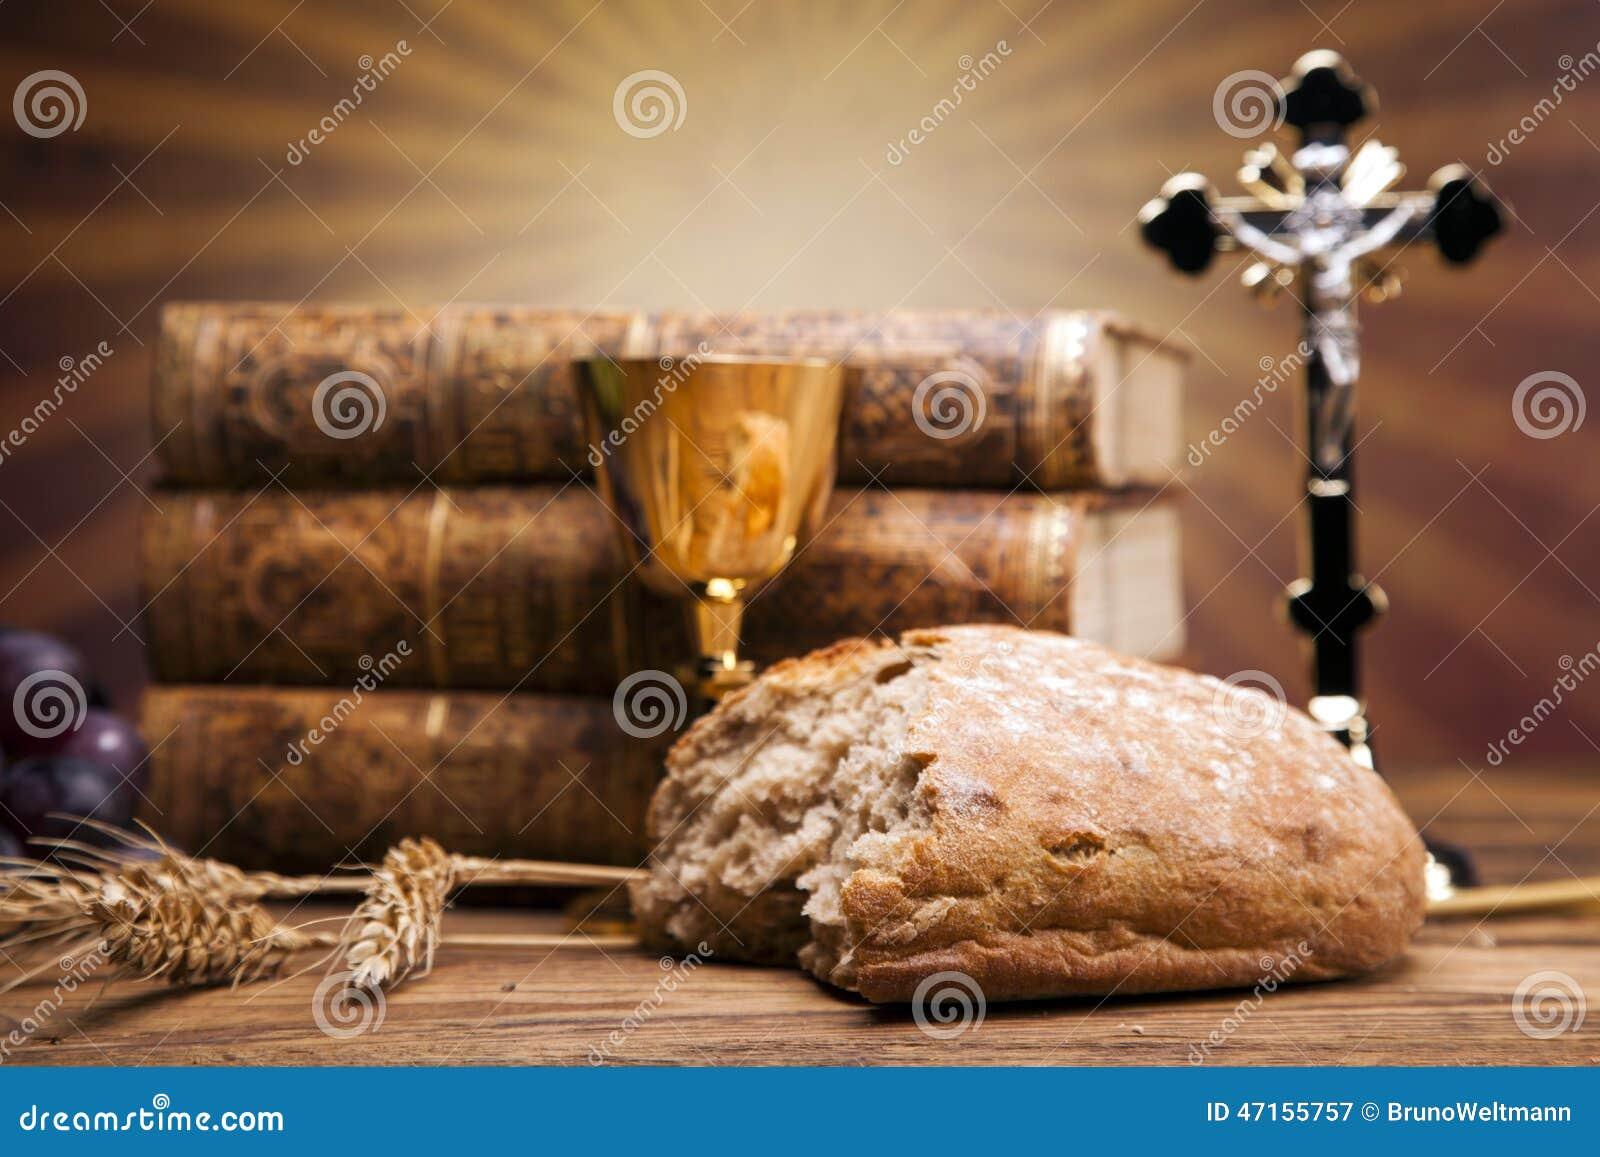 Objetos sagrados